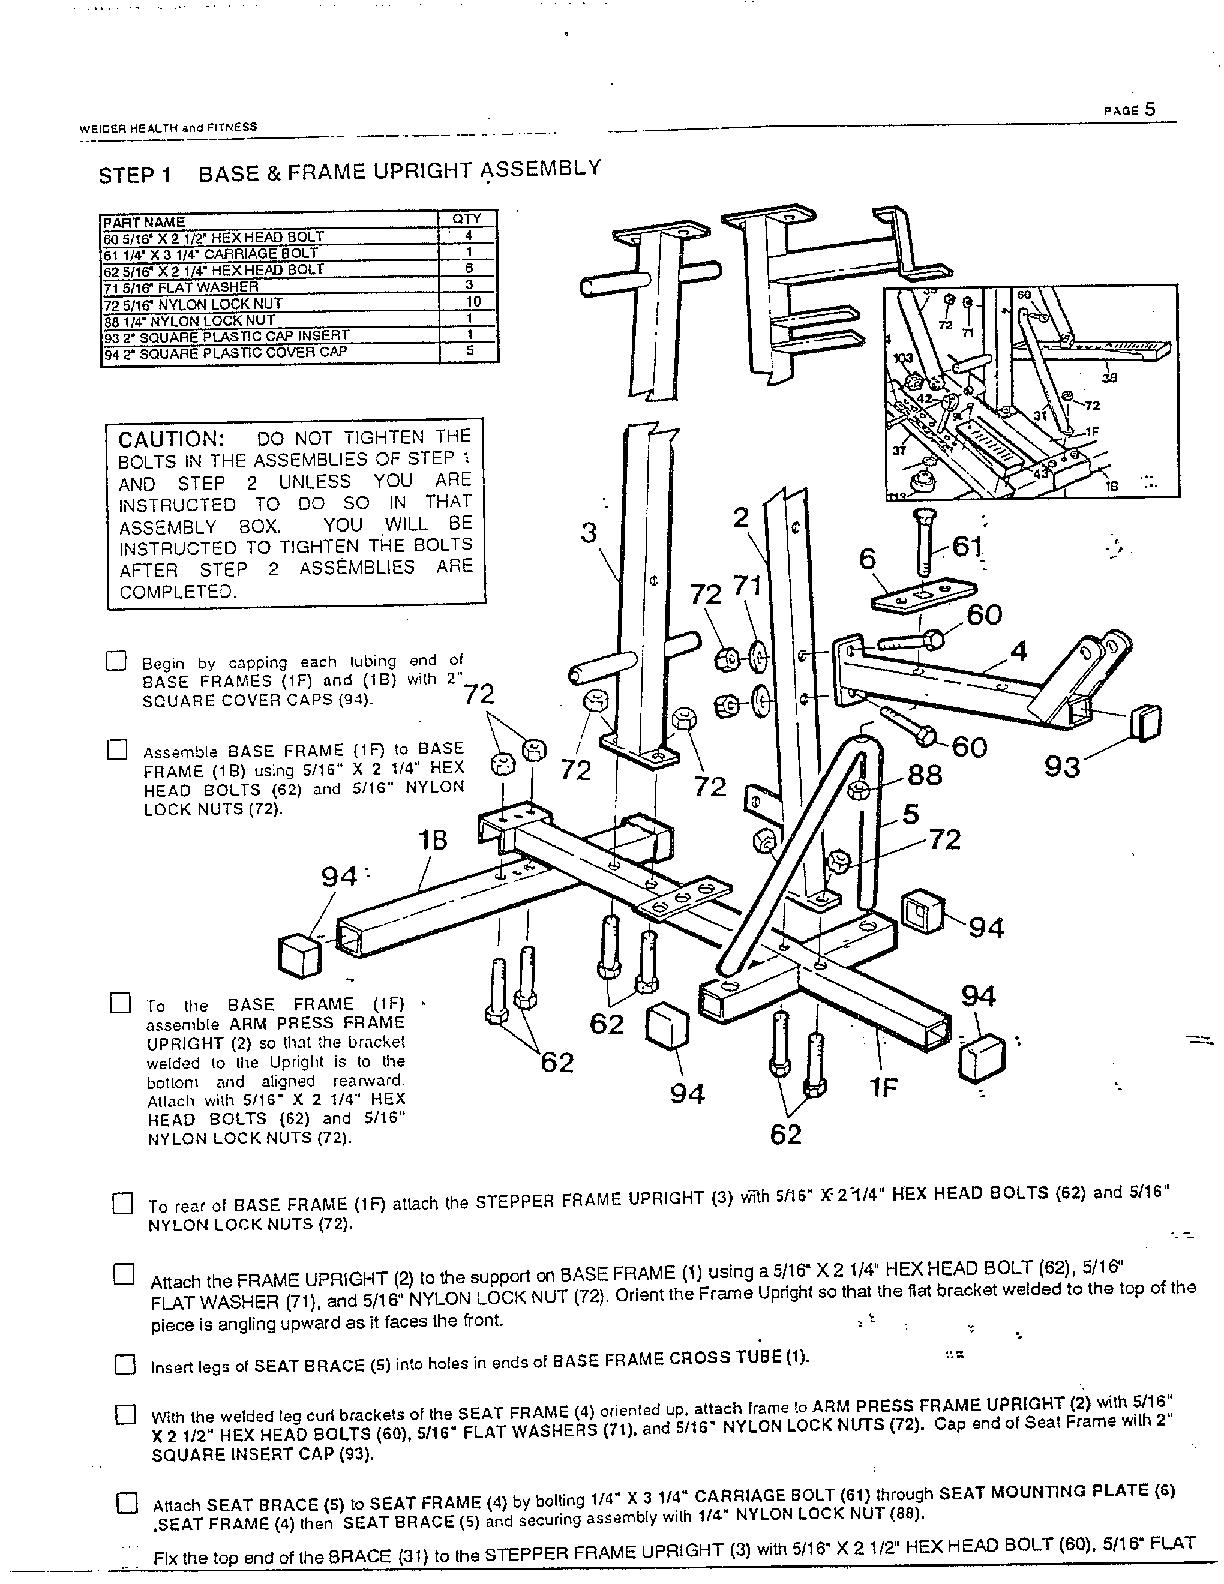 Weslo model E8001 misc exercise genuine parts